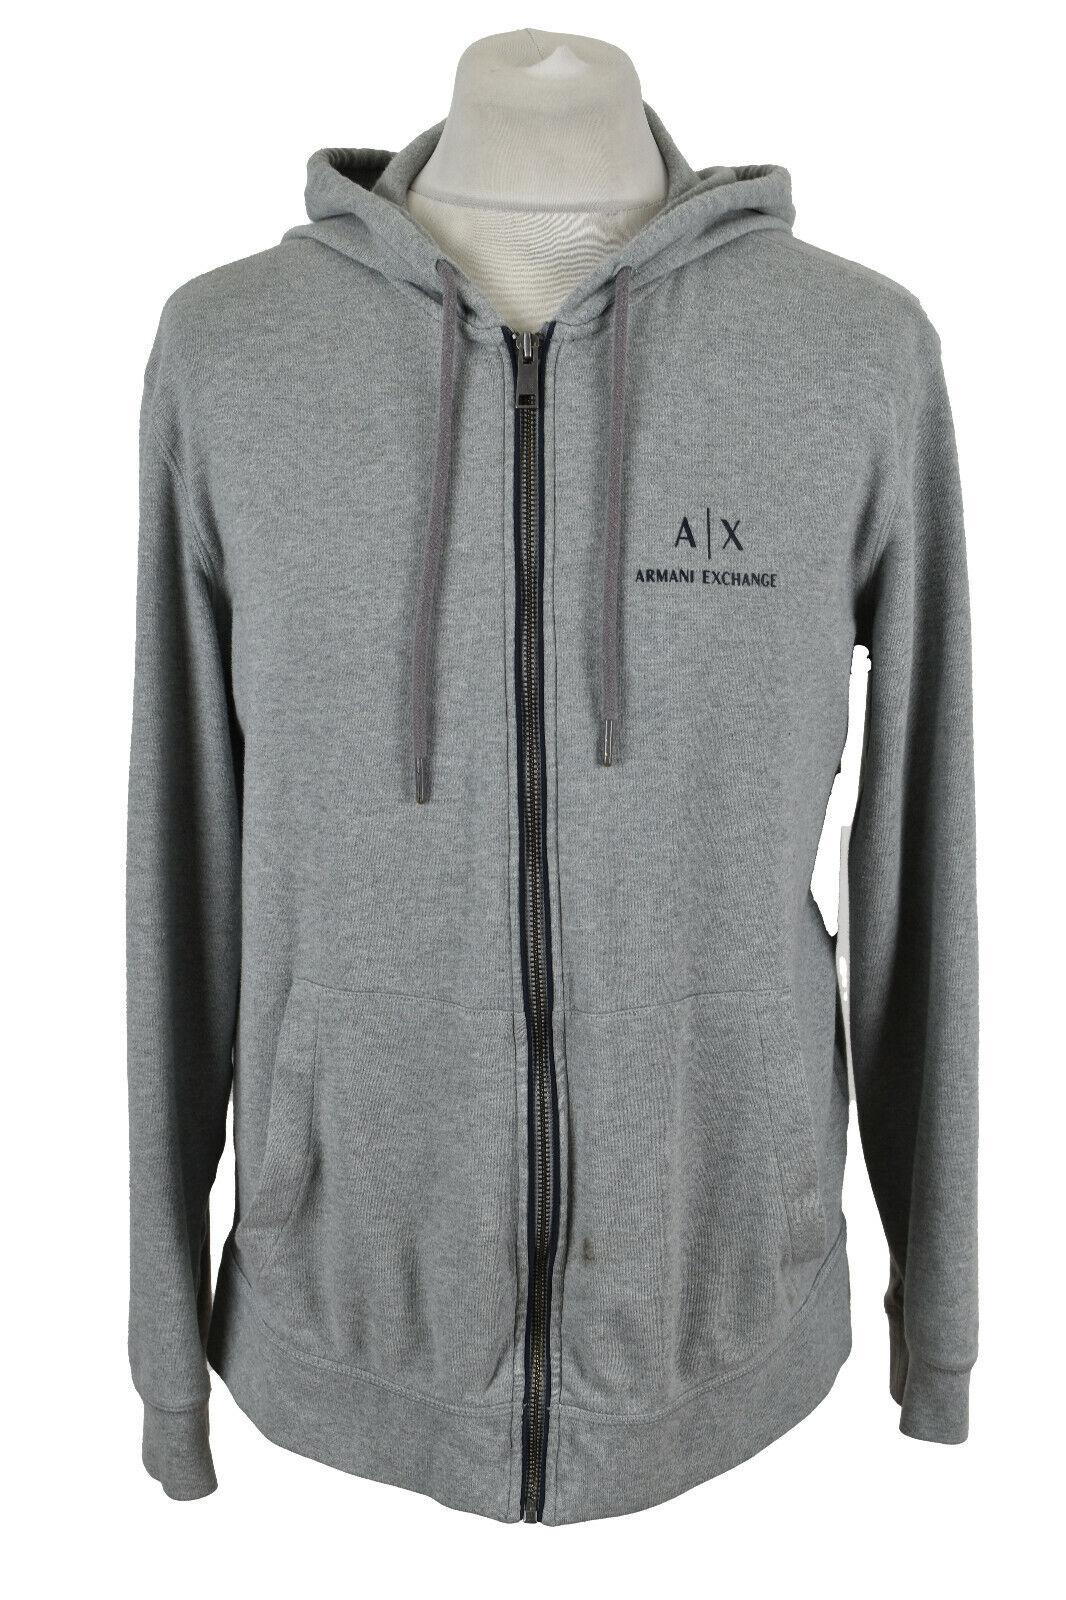 ARMANI EXCHANGE Grey Full Zip Hoodie size XL